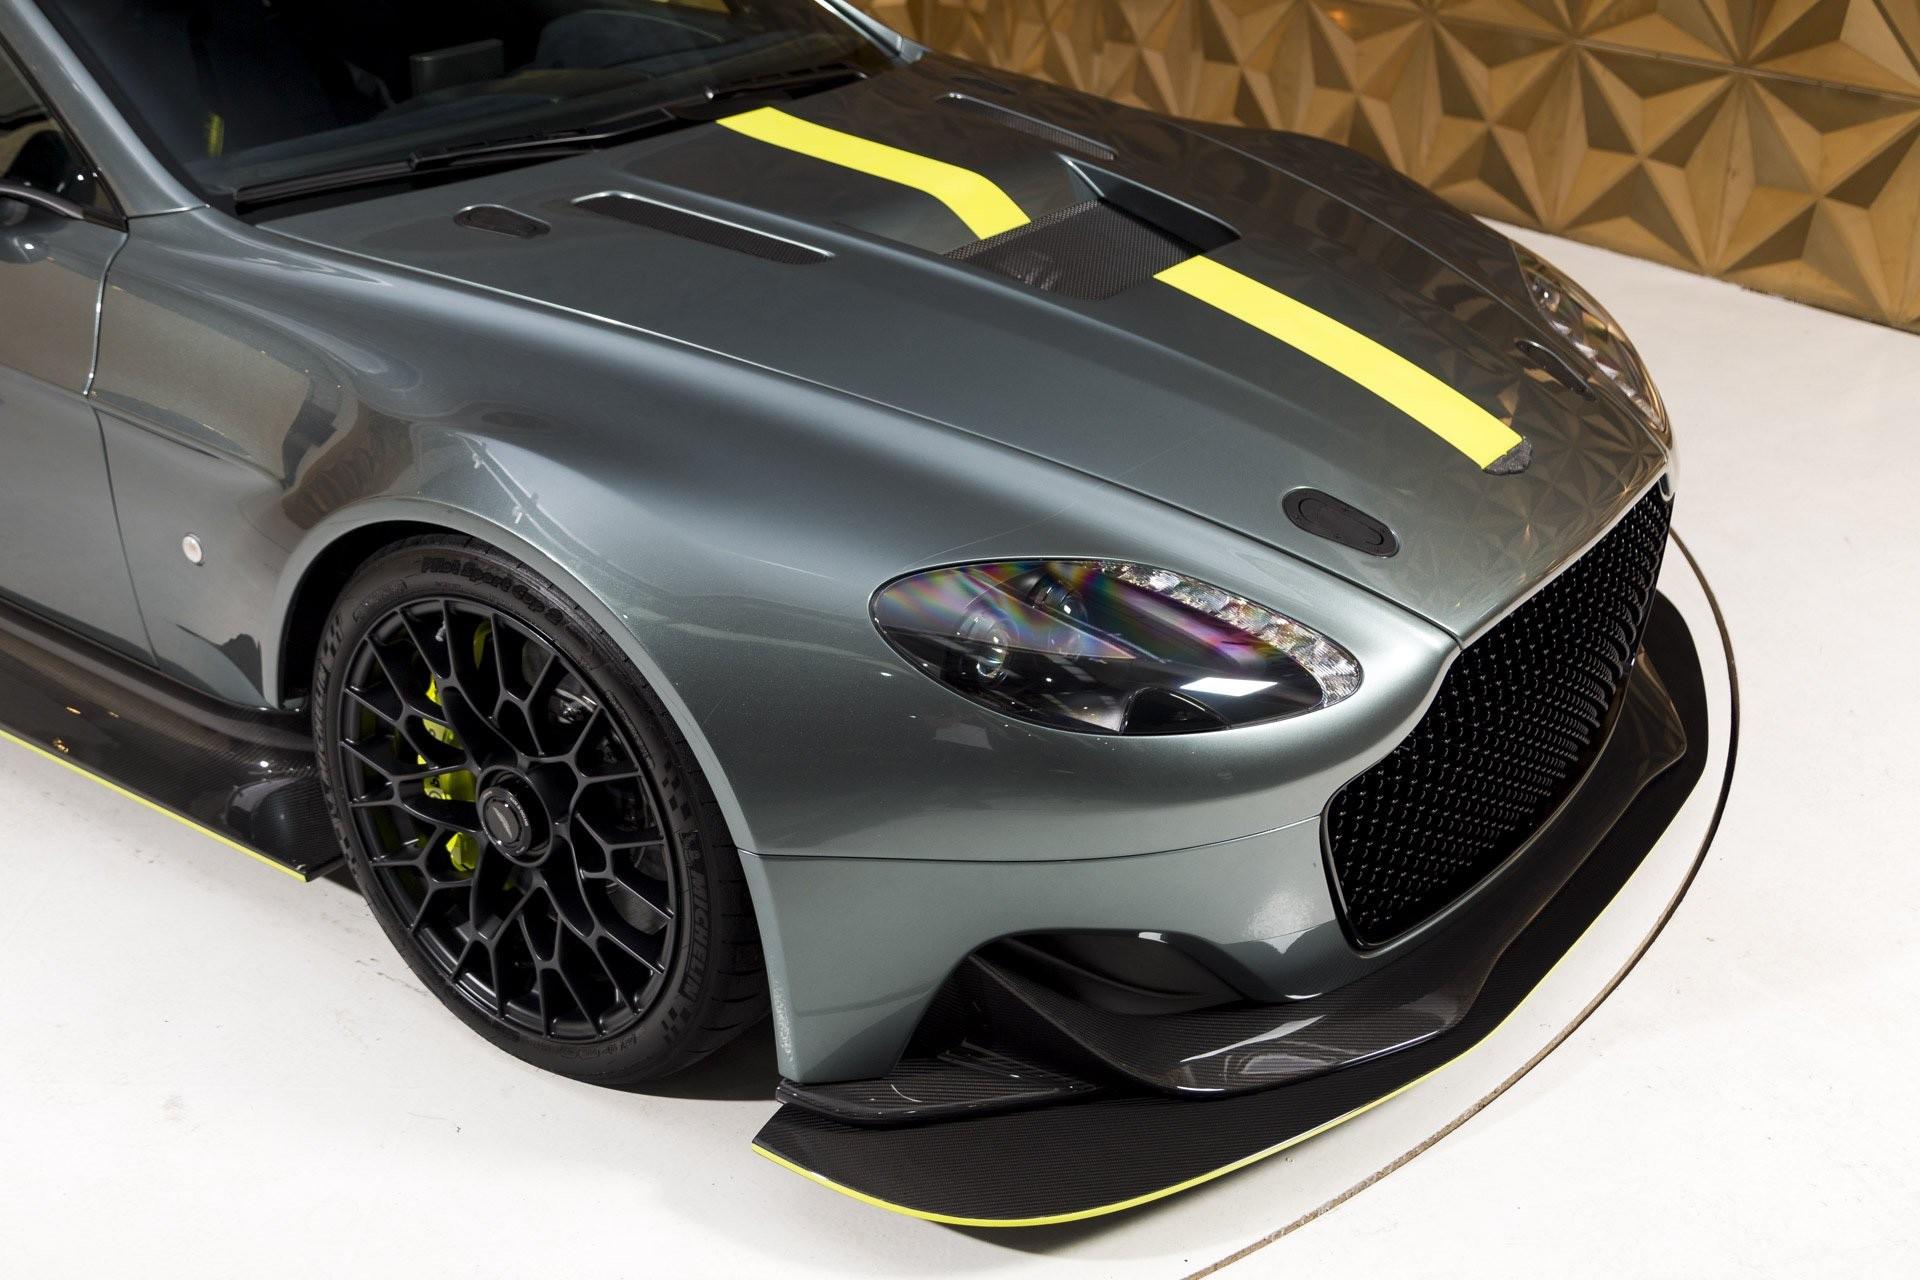 Aston_Martin_Vantage_AMR_Pro_sale-0026